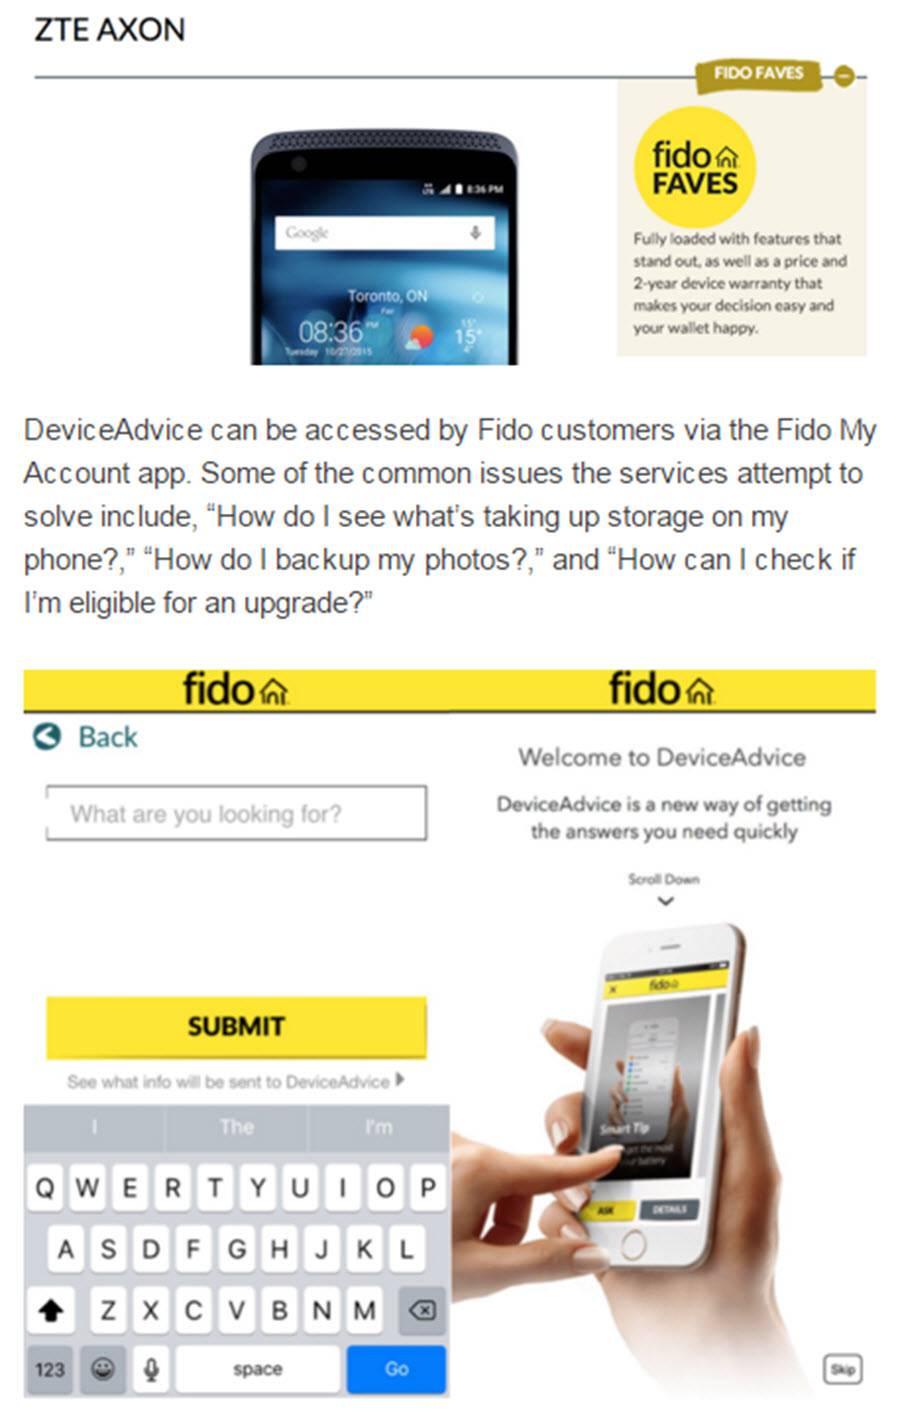 Fido DeviceAdvice Faves